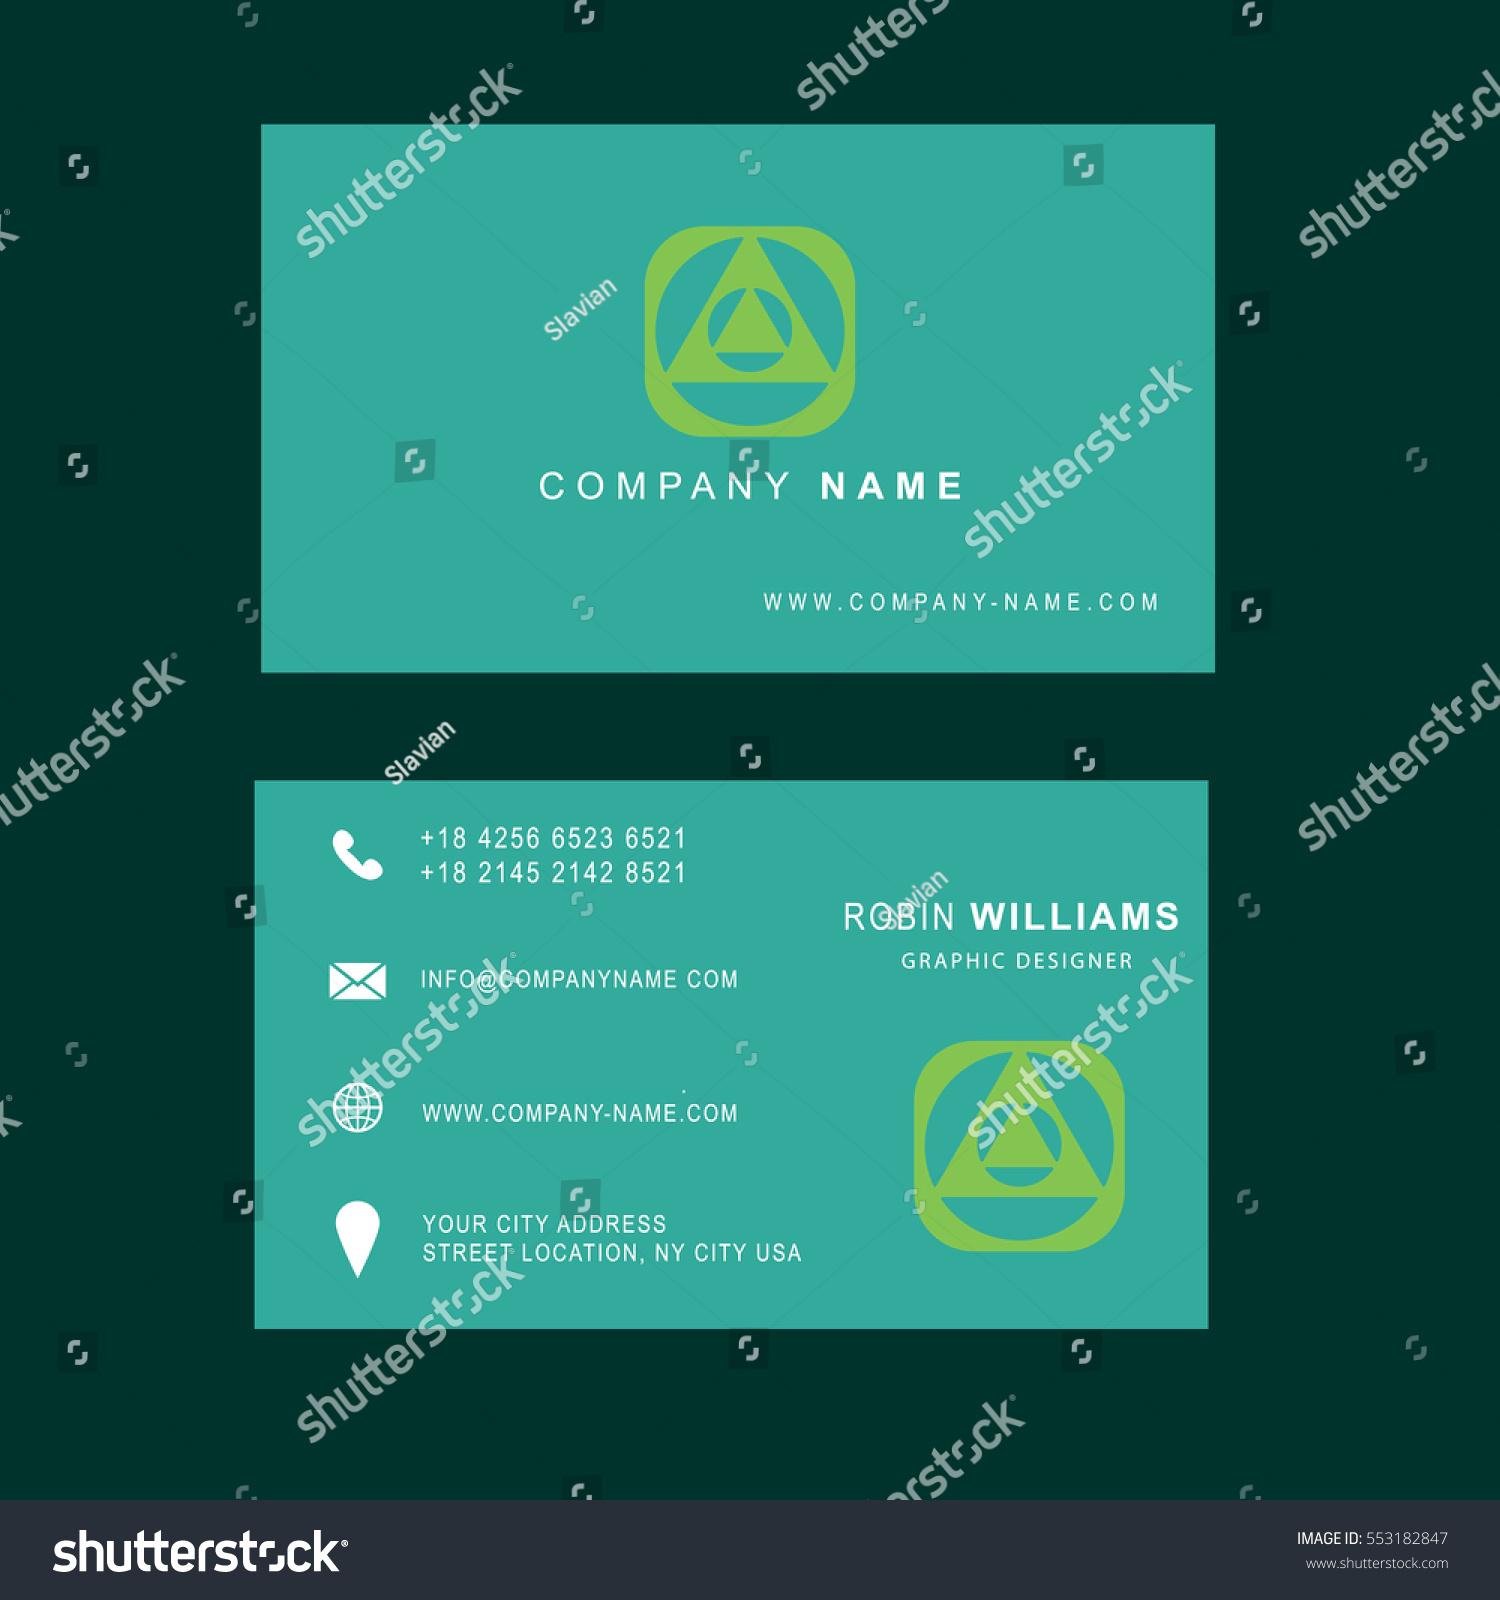 Light Green Business Card Modern Design Stock Photo (Photo, Vector ...